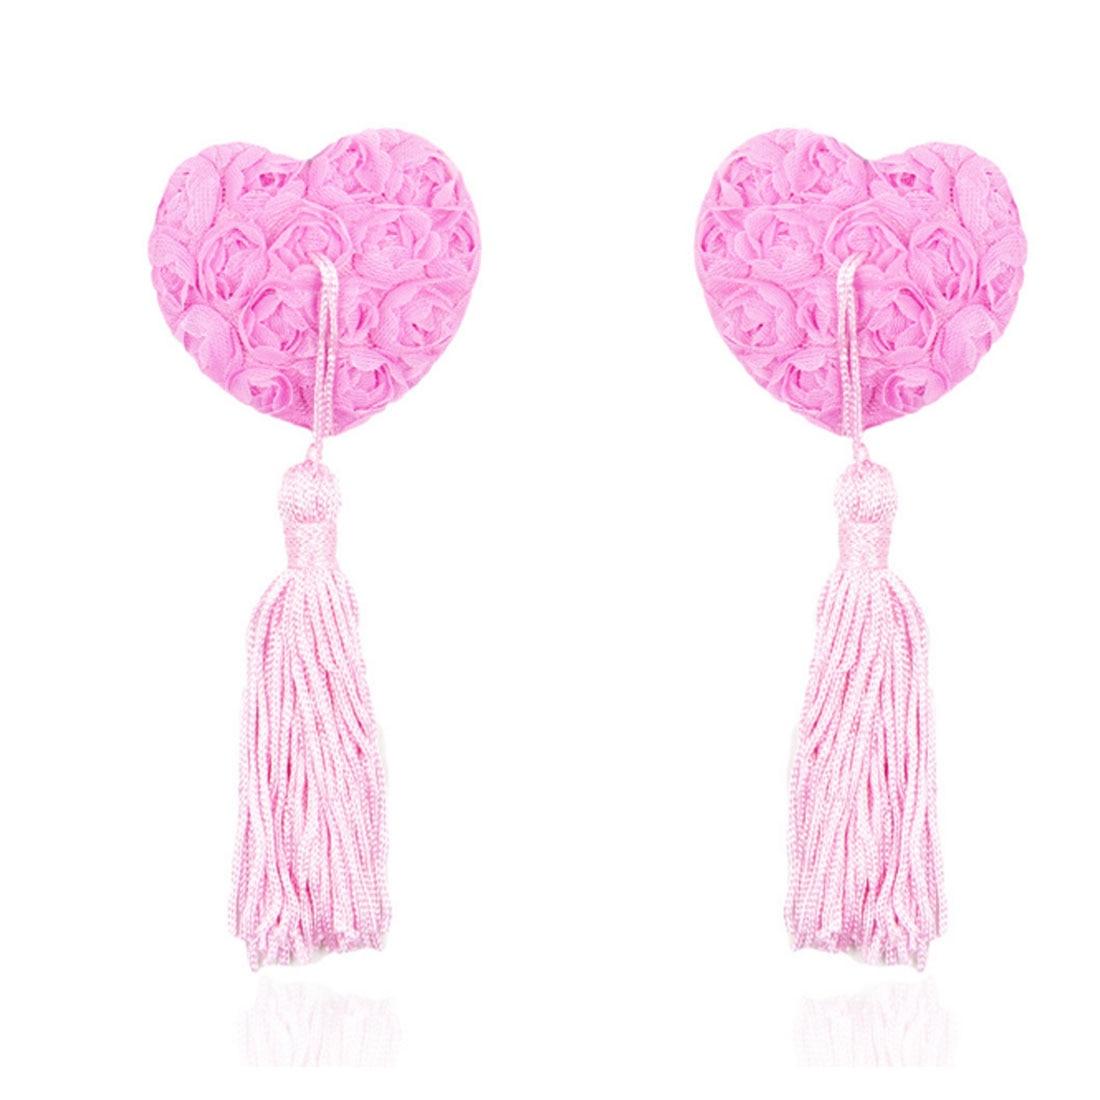 New 2pcs/set Self Adhesive Sequin Tassel Cover Fur Red Ribbon Rose Heart Shape Bra Nipple Cover Pasties Breast Petals